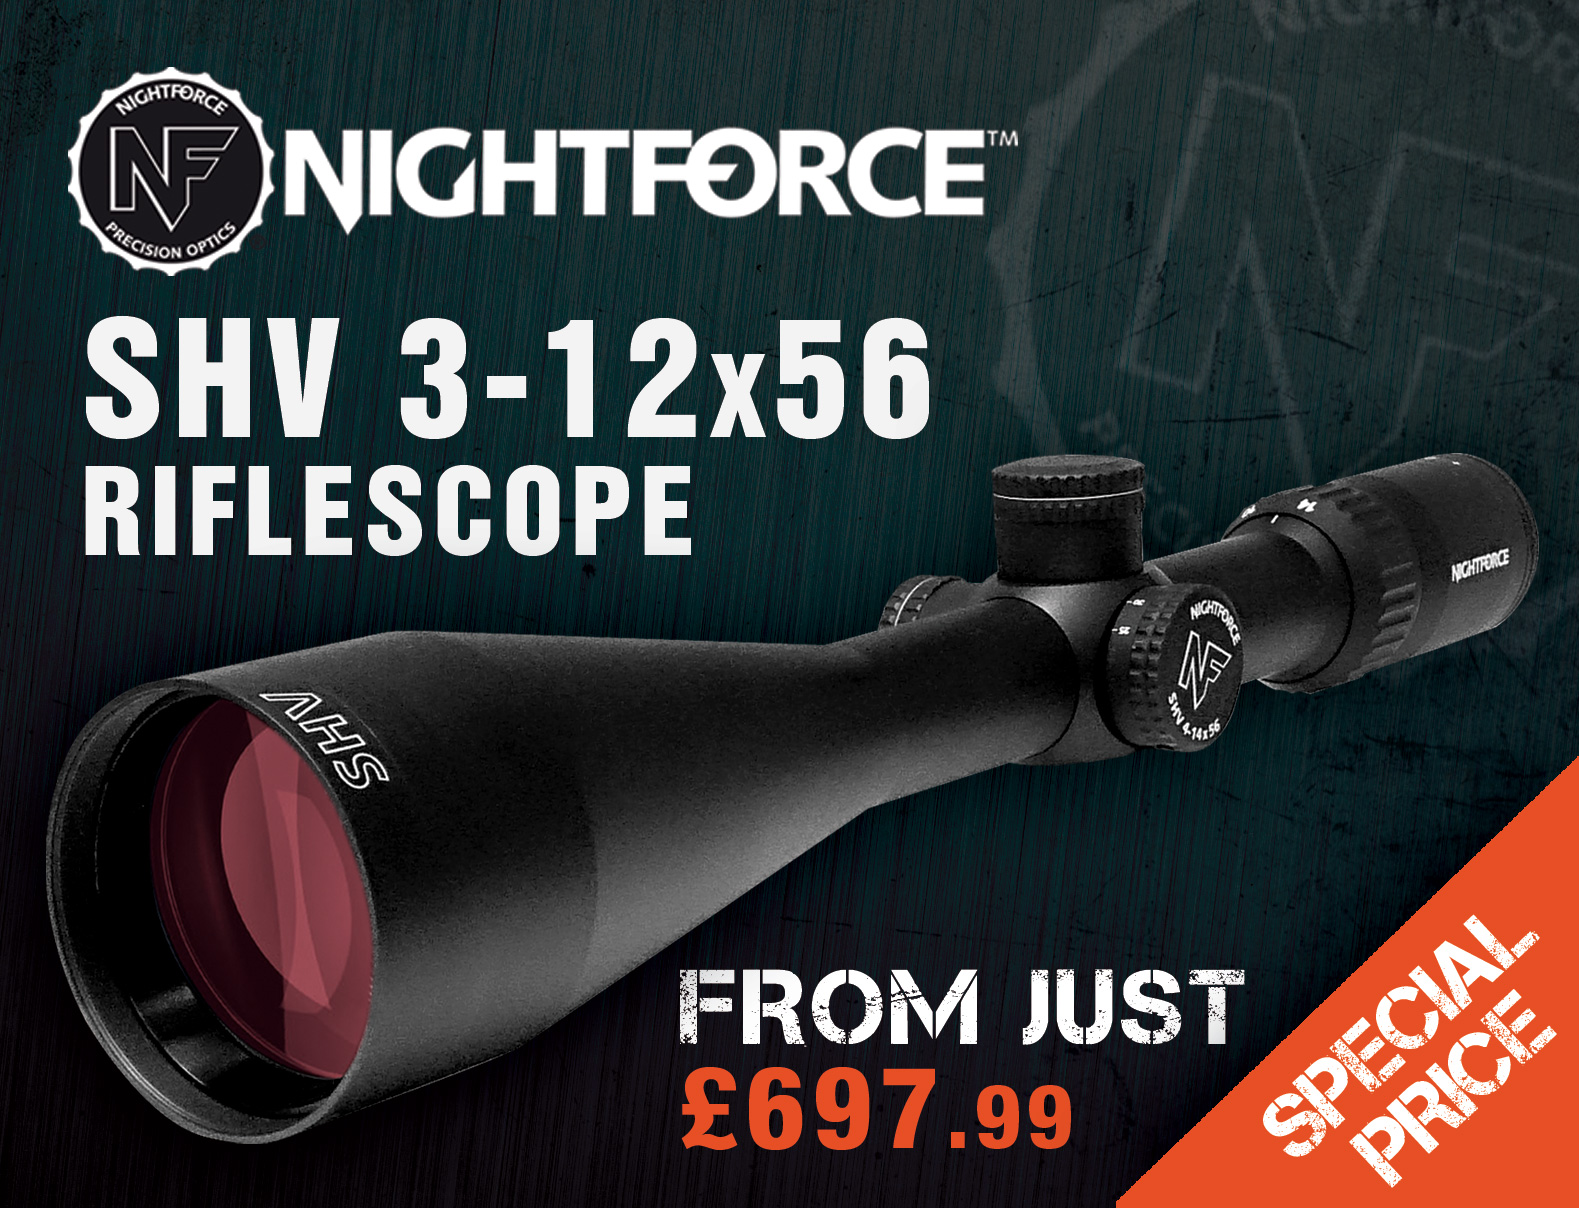 Nightforce SHV 3-12x56